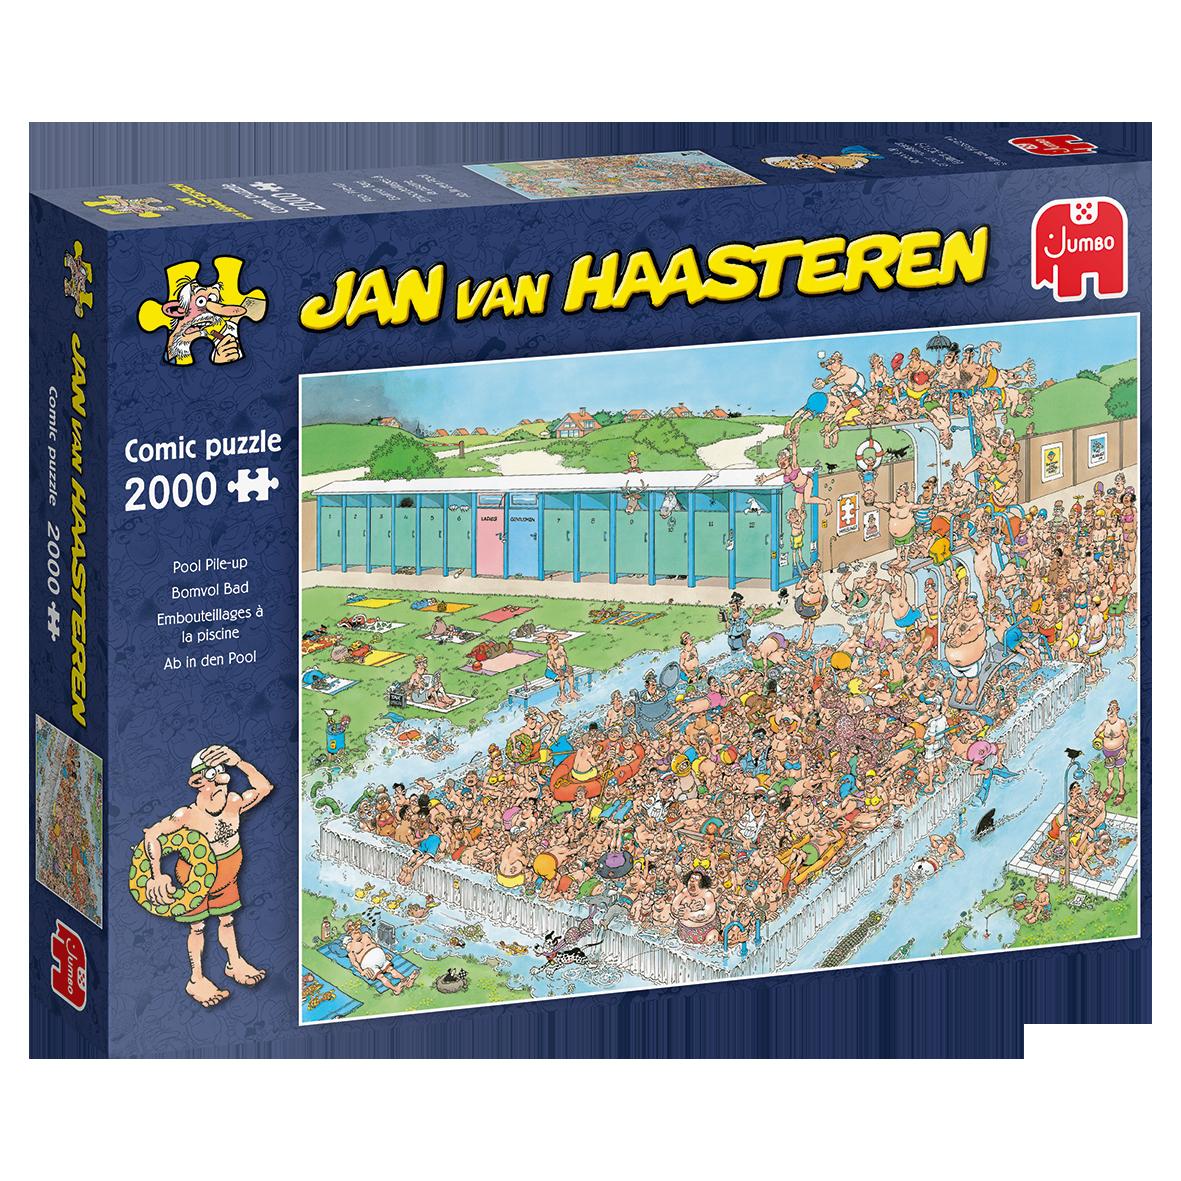 Jan van Haasteren Bomvol Bad